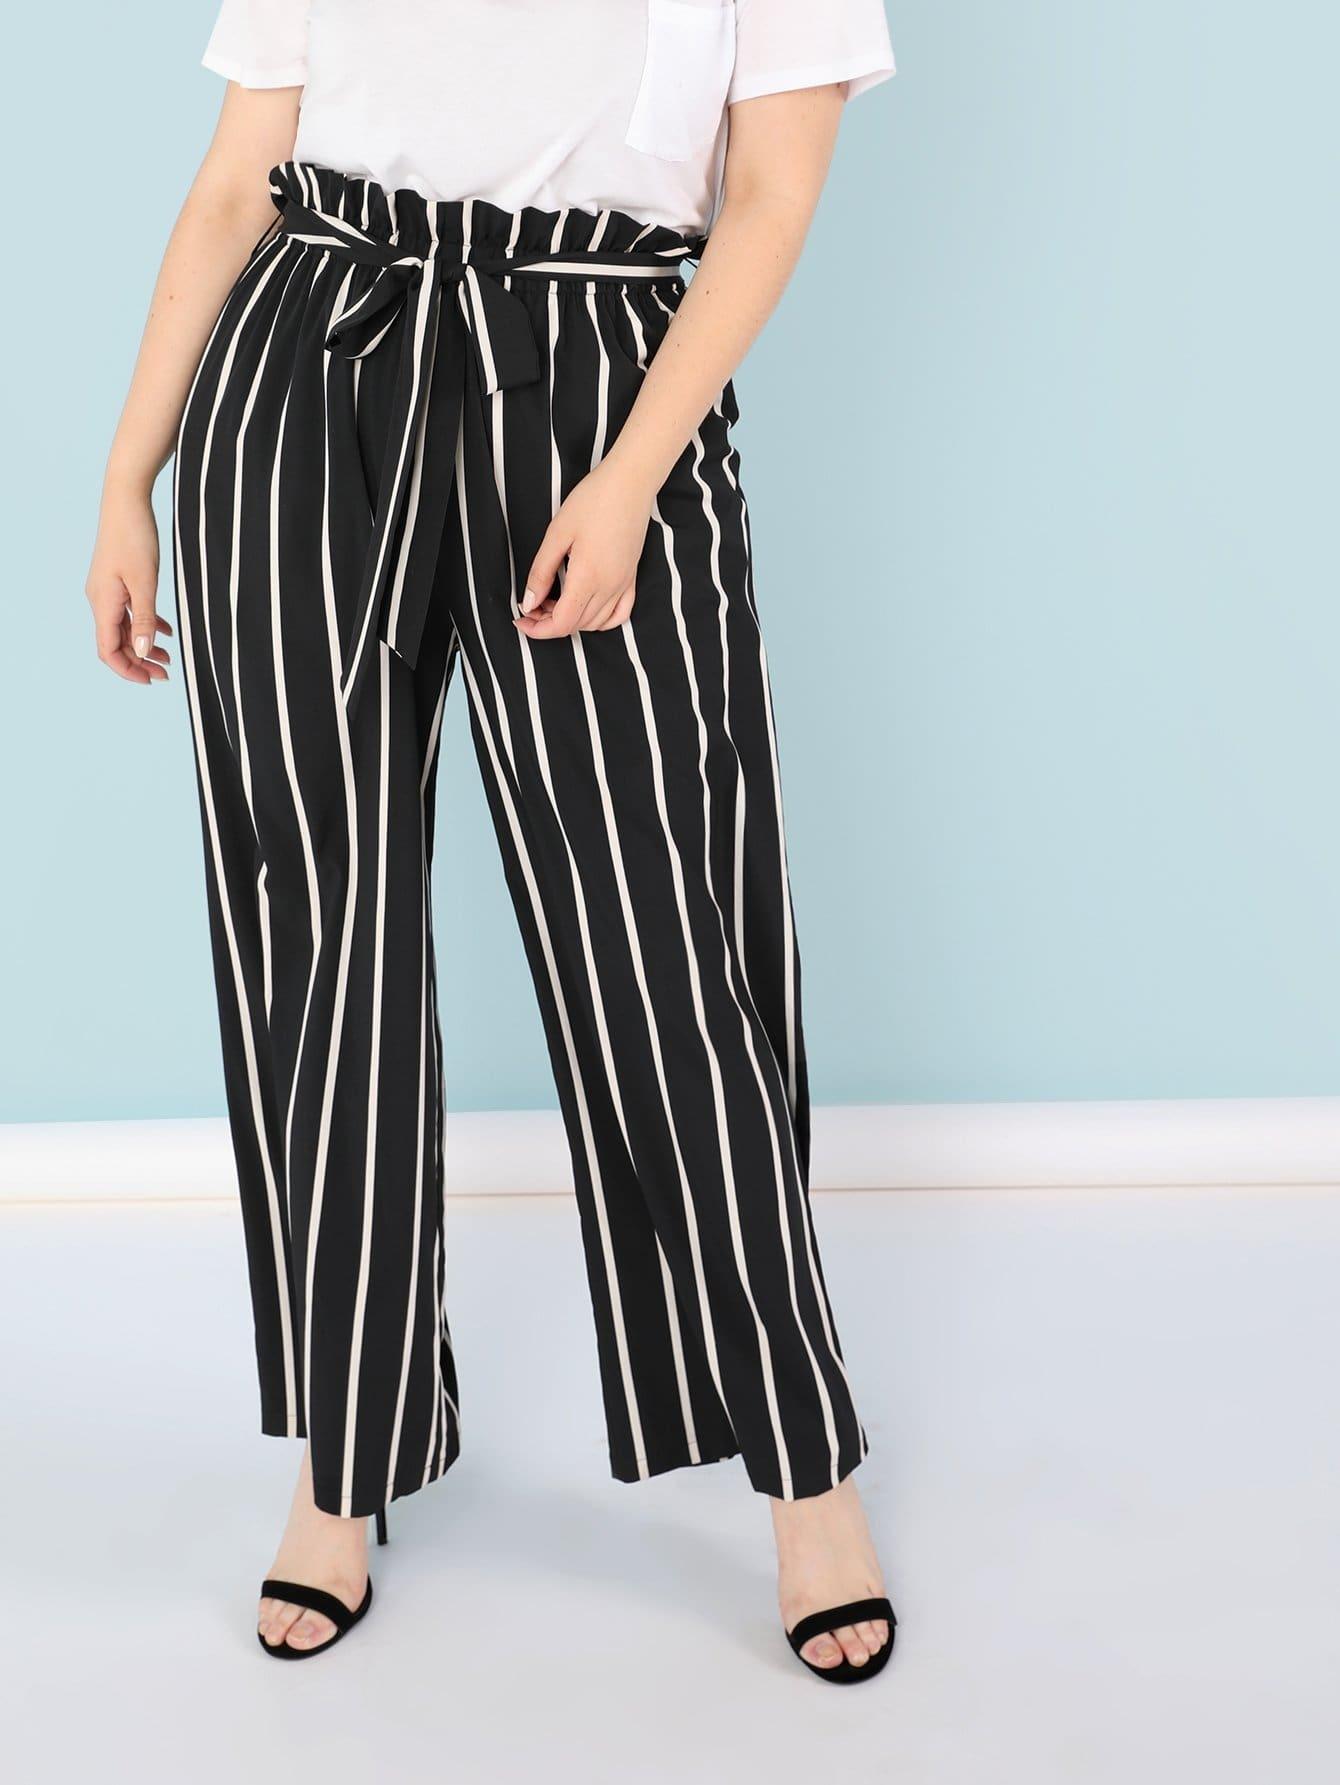 Ruffle Waist Vertical Stripe Flare Hem Pants elastic waist scallop ruffle hem pants